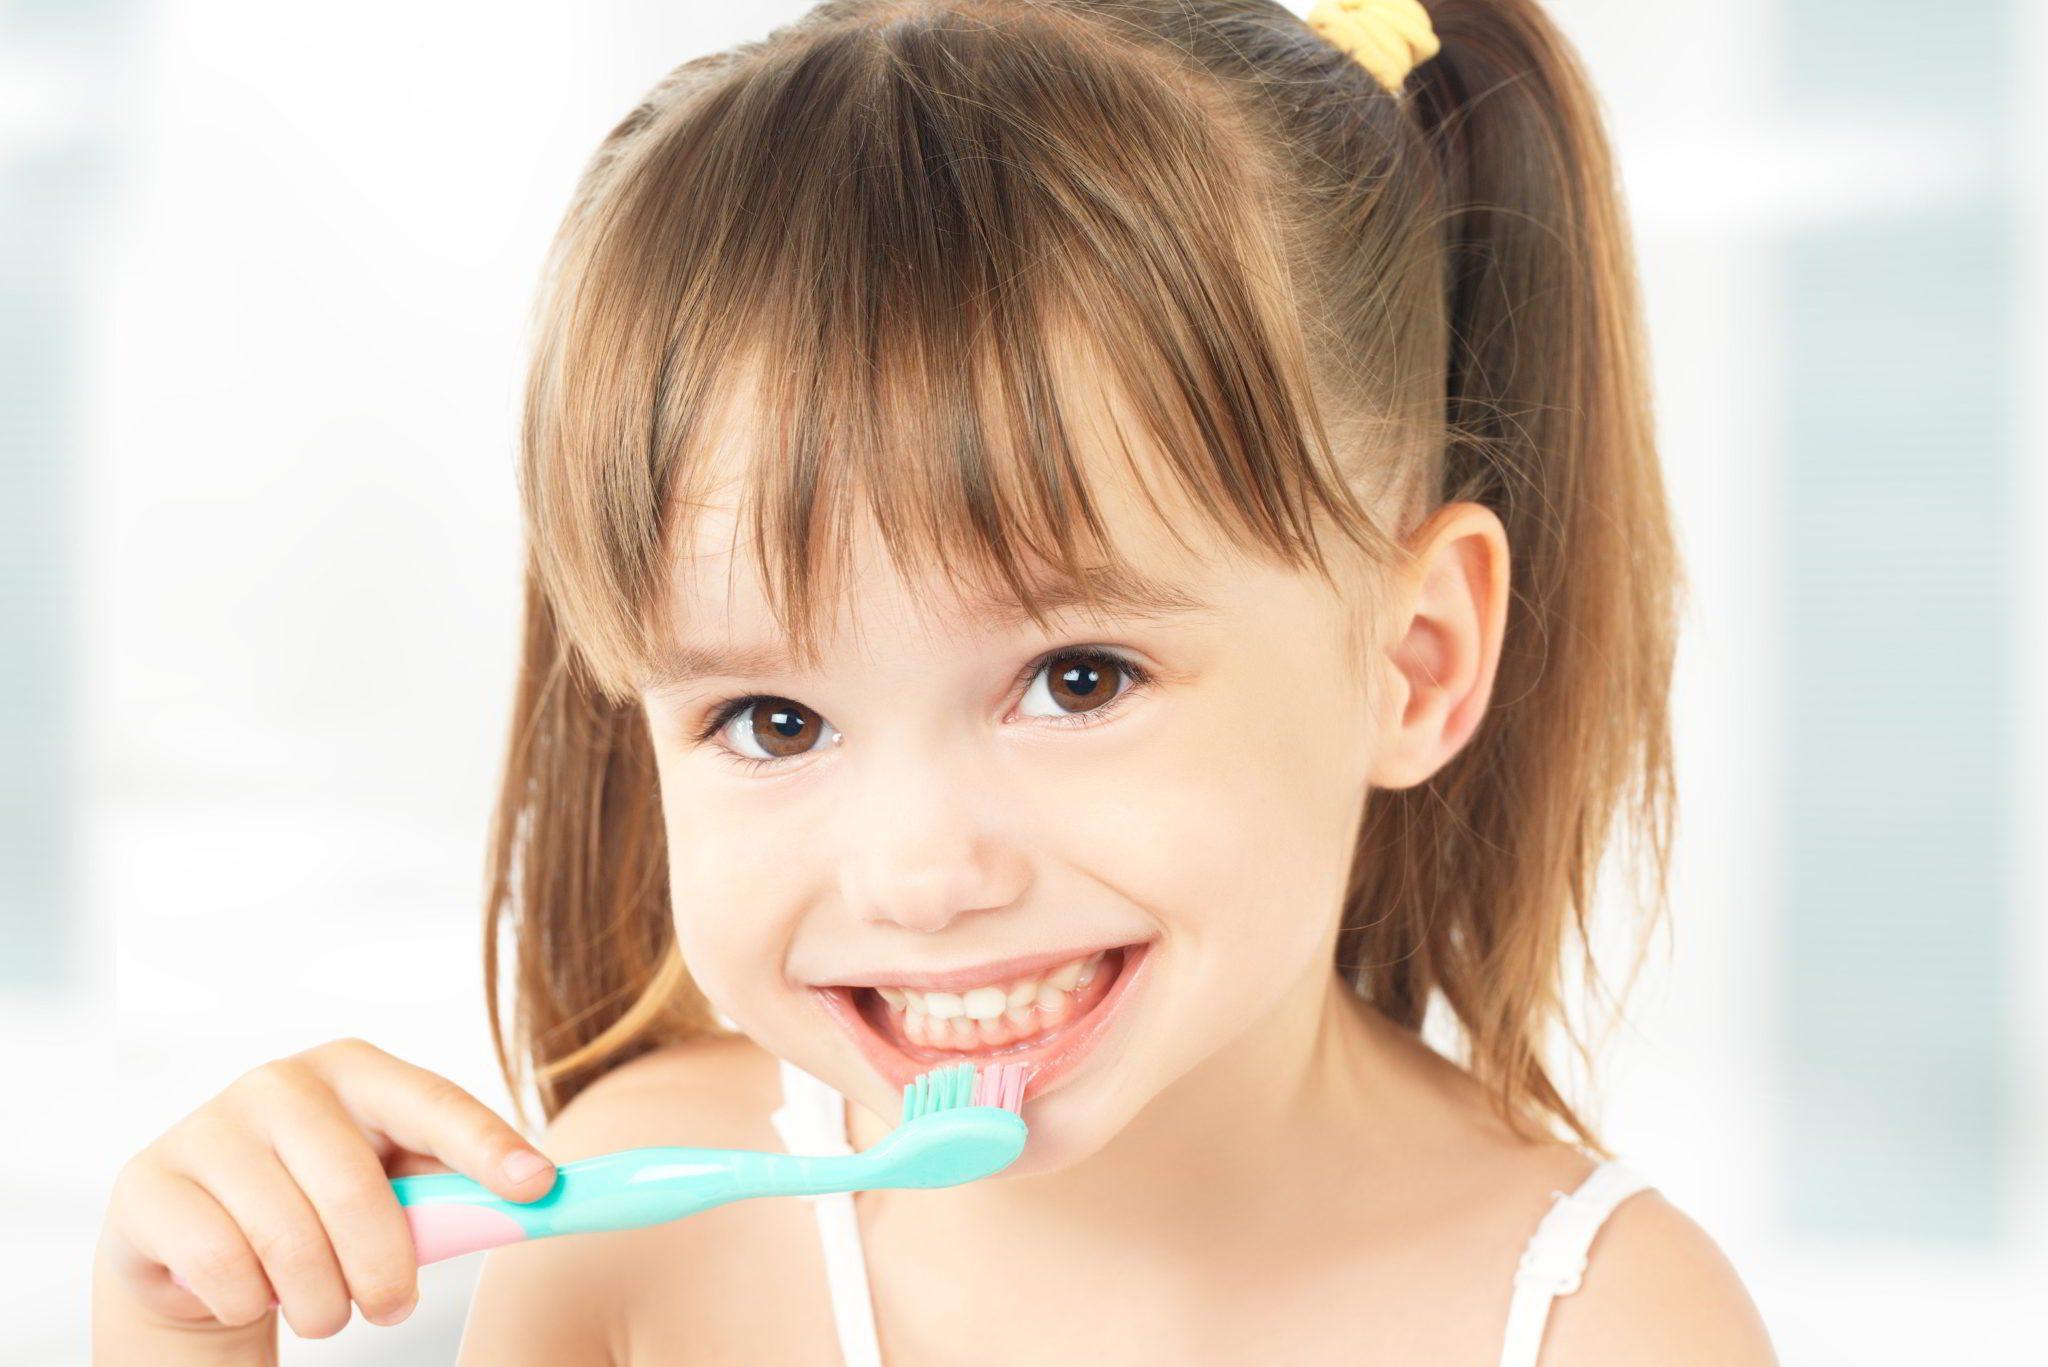 Campbelltown Family Dental Care stock 1st visit cover image